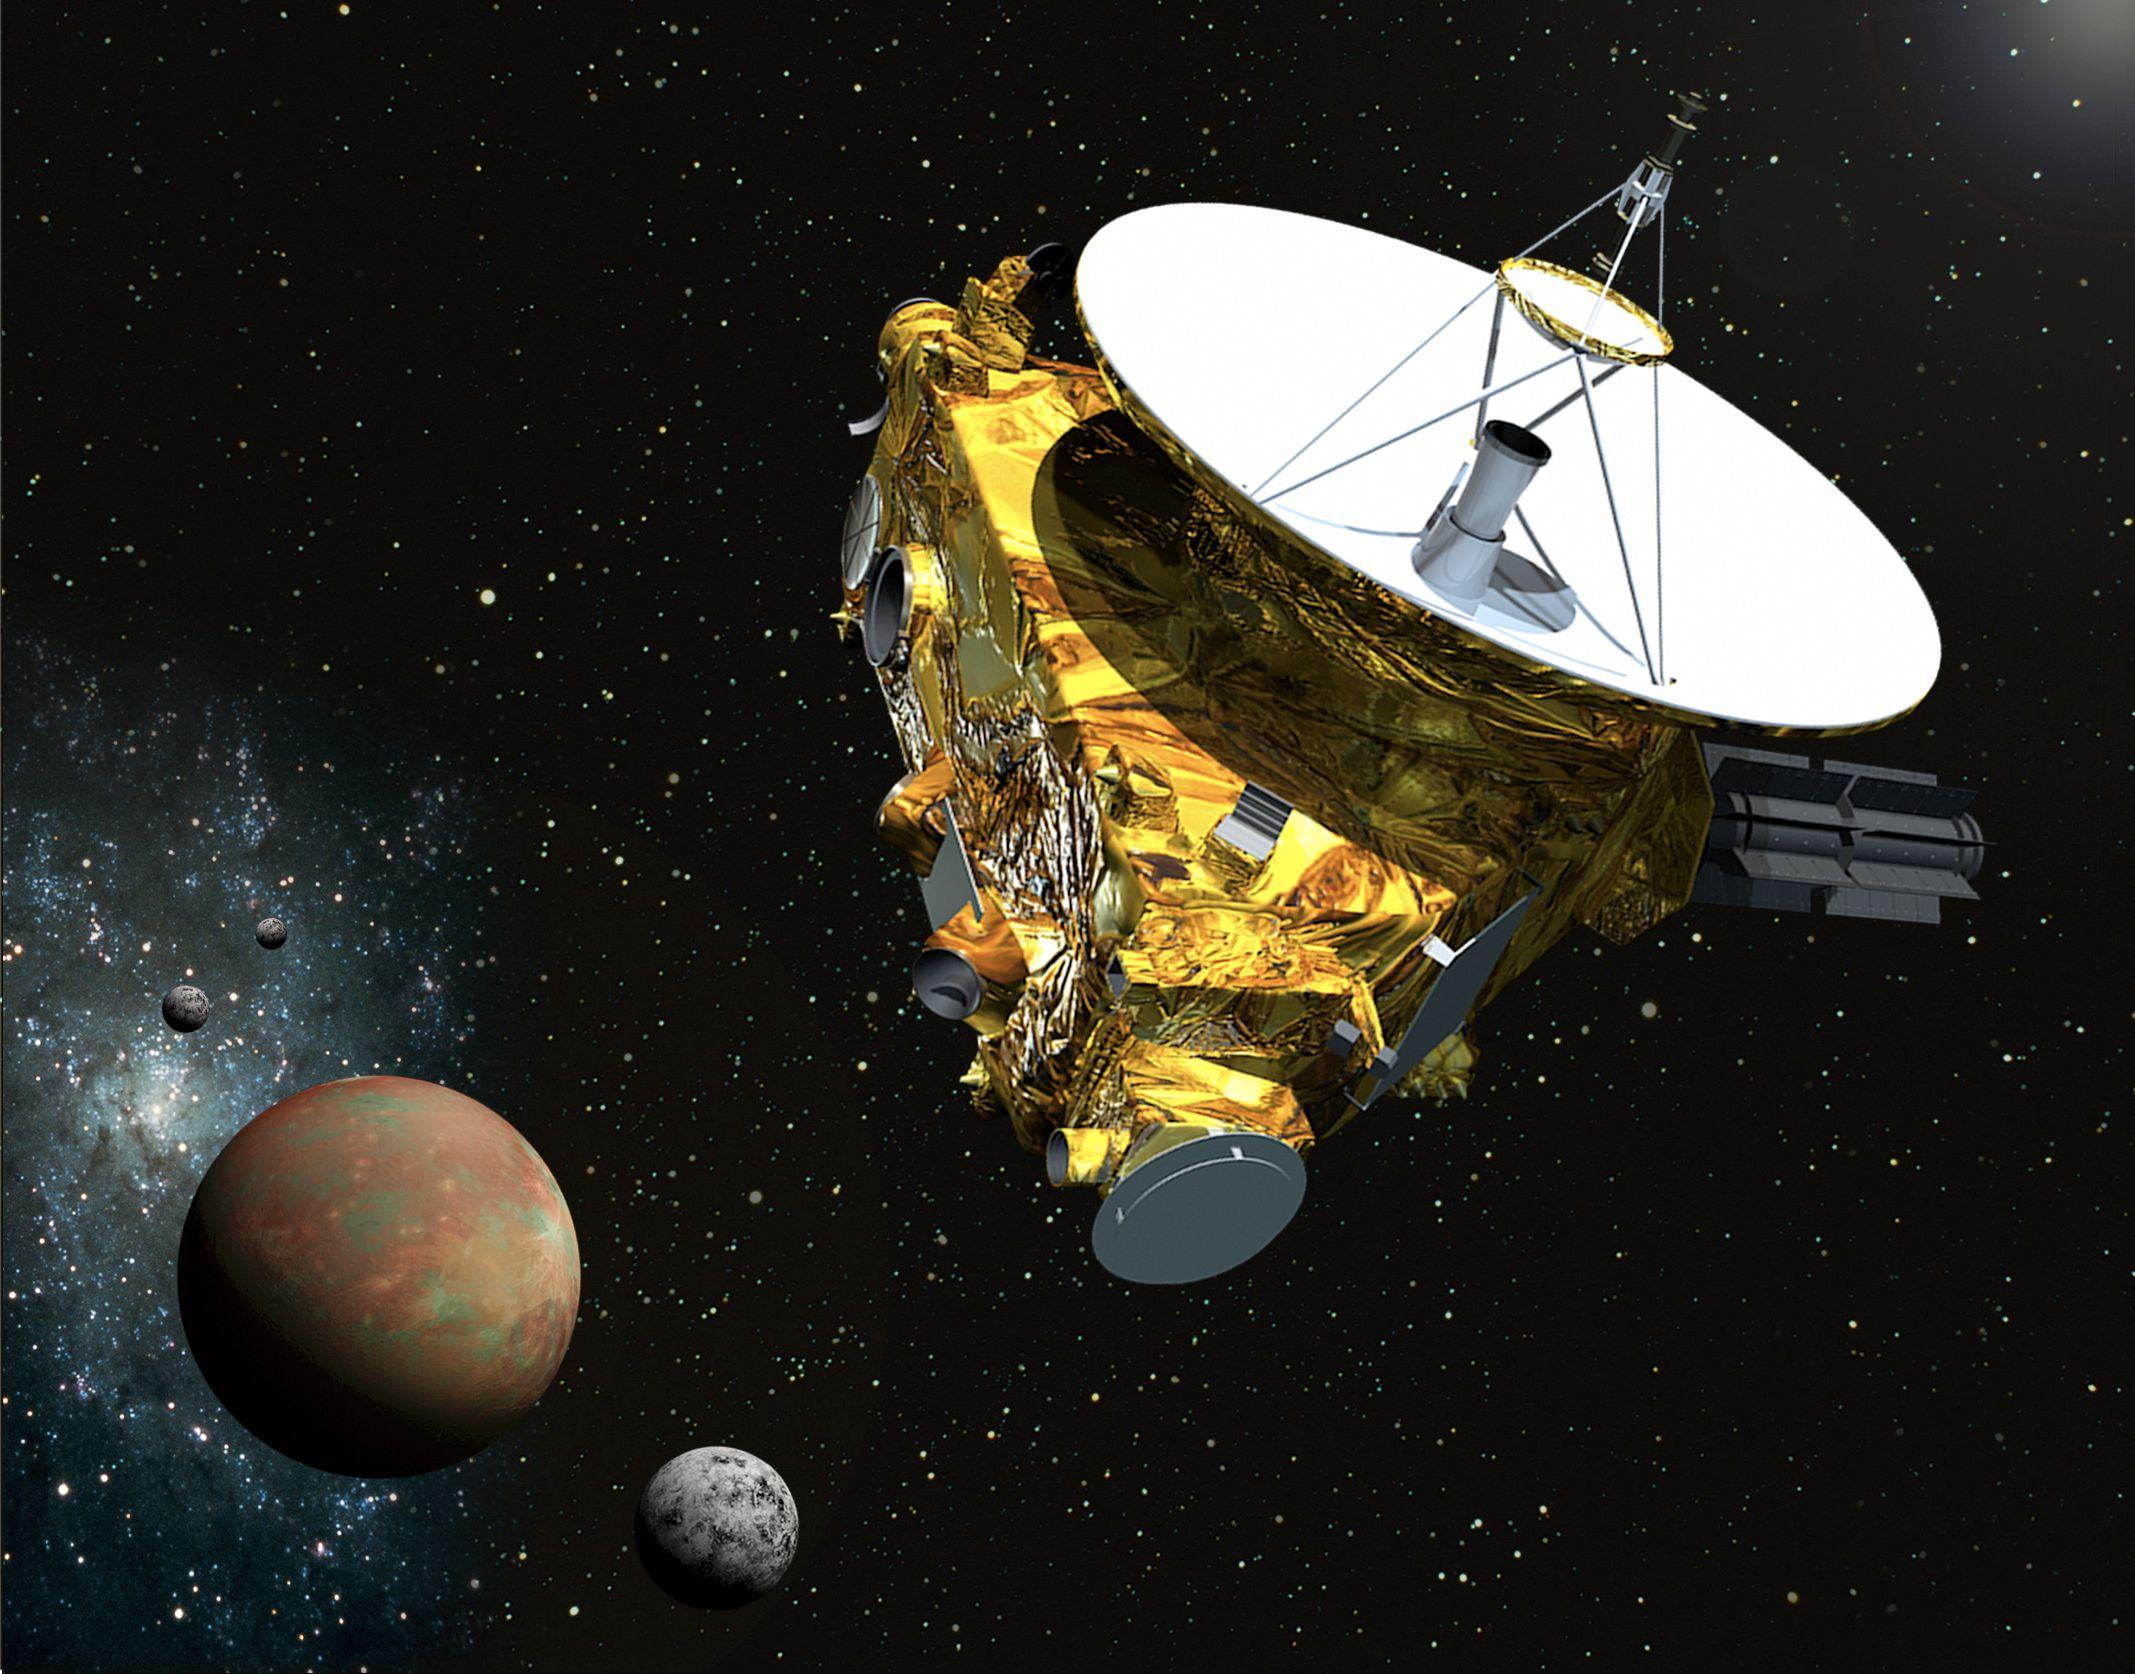 NASA Pluto Probe to Wake From Hibernation Next Month